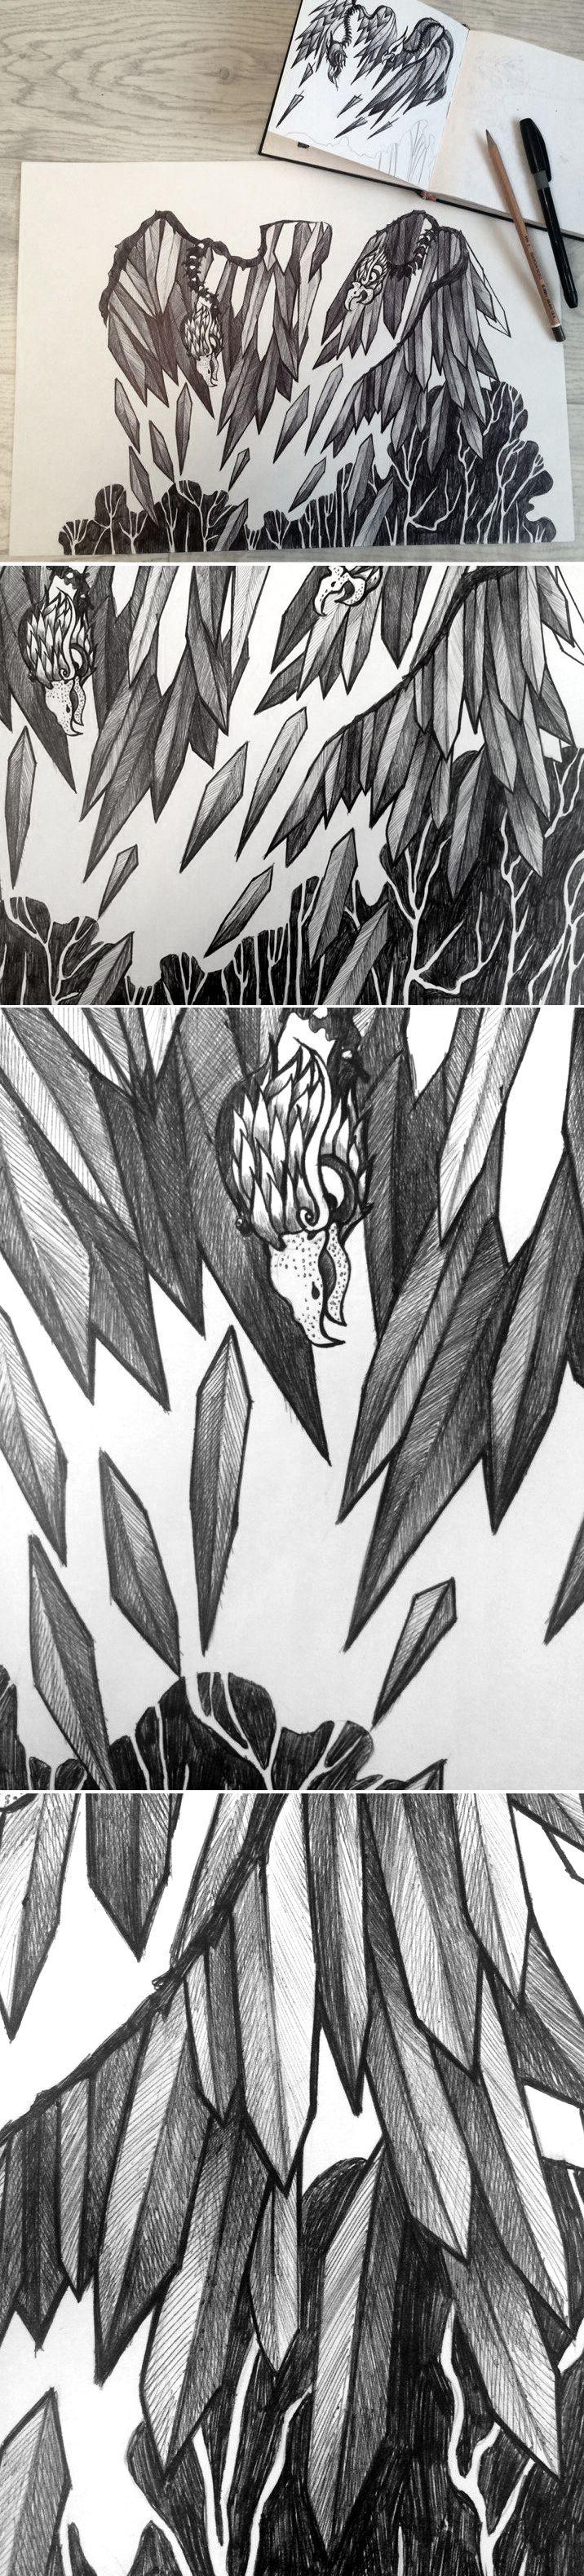 Графика на тему подвигов Геракла, подвиг 3 - Истребление Стимфалийских птиц. гелевая ручка The graphics on the theme of the labors of Hercules , a feat 3 - Extermination stymphalian birds . gel pen #art #graphics #drawing #birds #feathers #Hercules